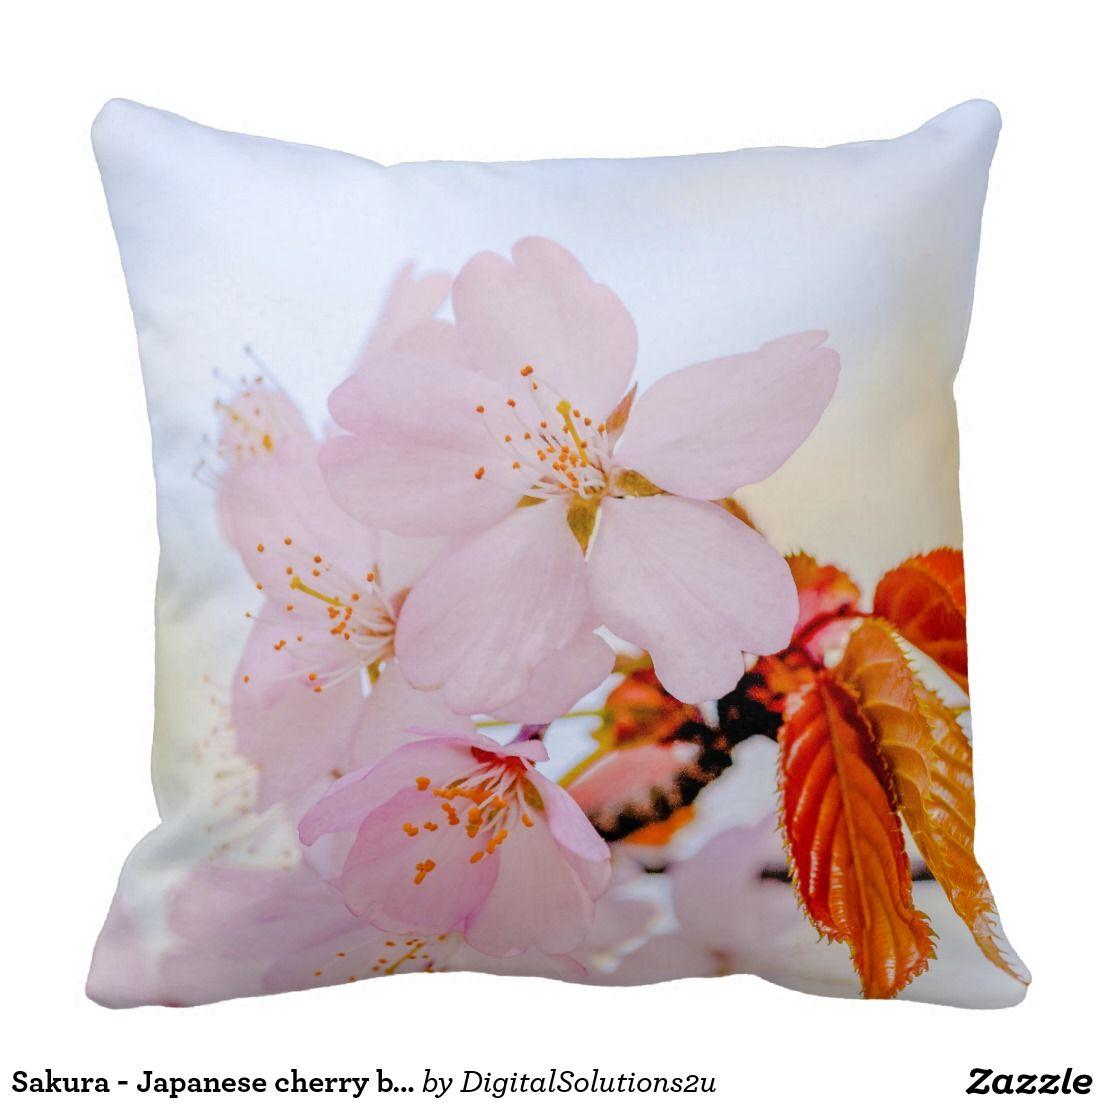 Sakura - Japanese cherry blossom Pillow